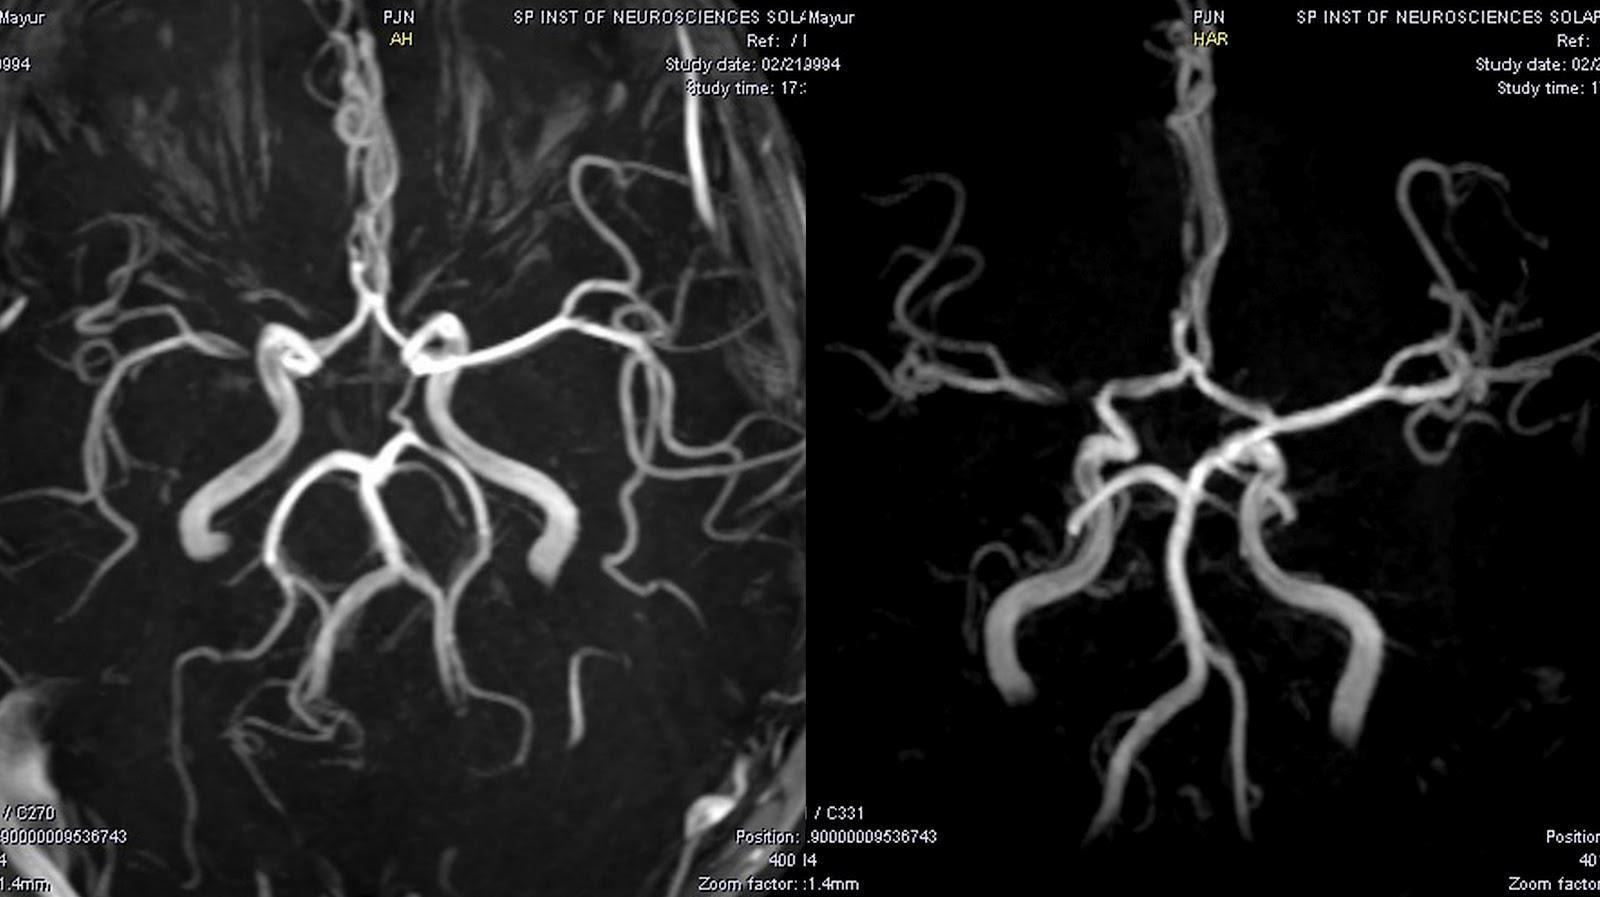 Dr Balaji Anvekar\'s Neuroradiology Cases: 01/02/12 - 01/03/12